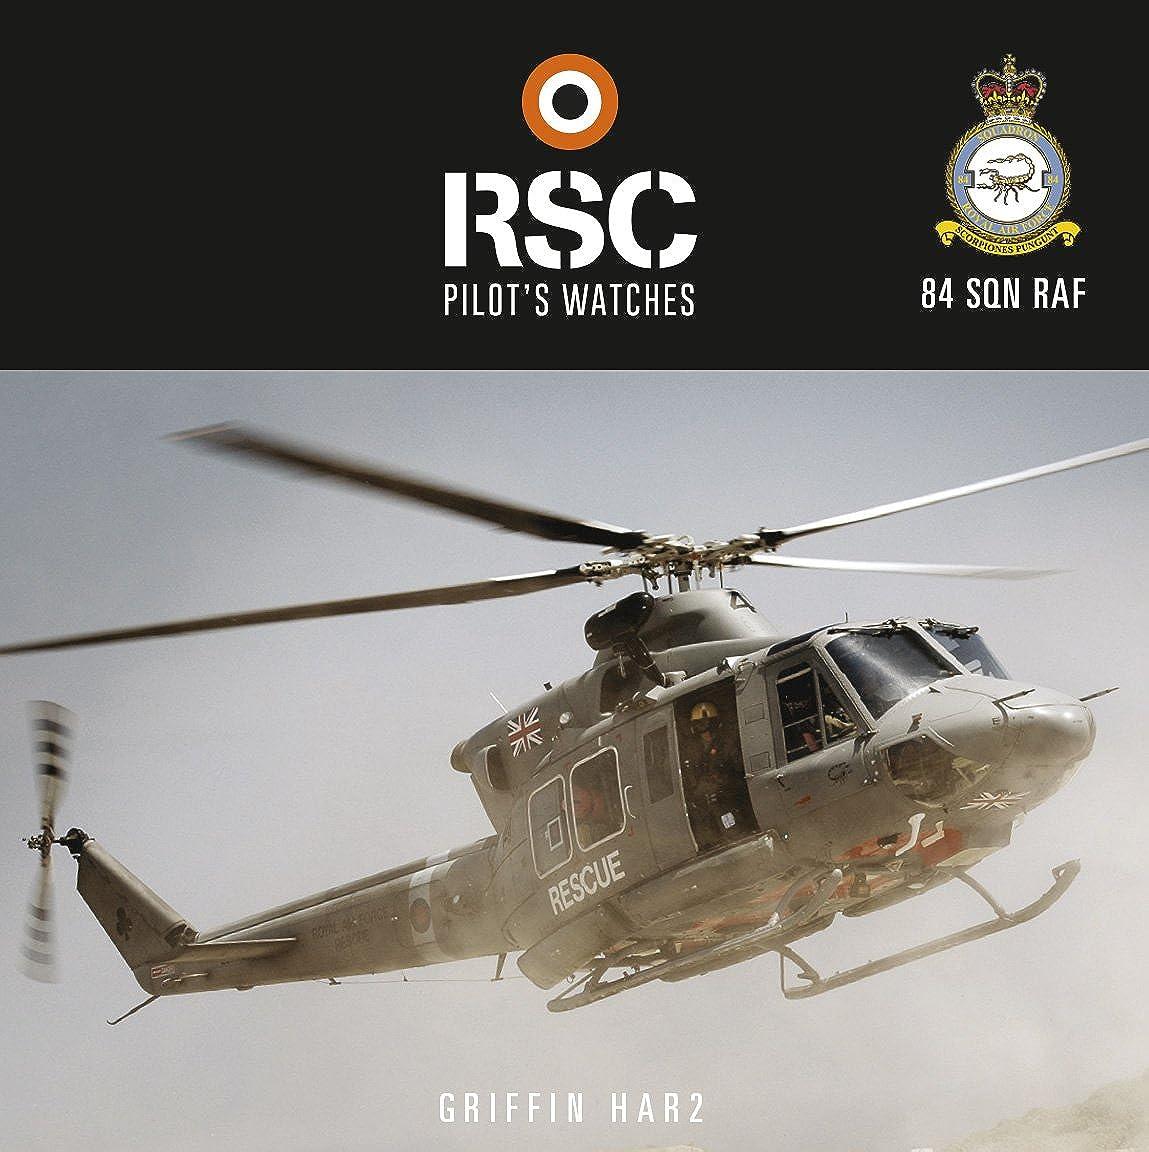 RSC5313, Griffin HAR2, RSC Pilot's Watches, Swiss Movement